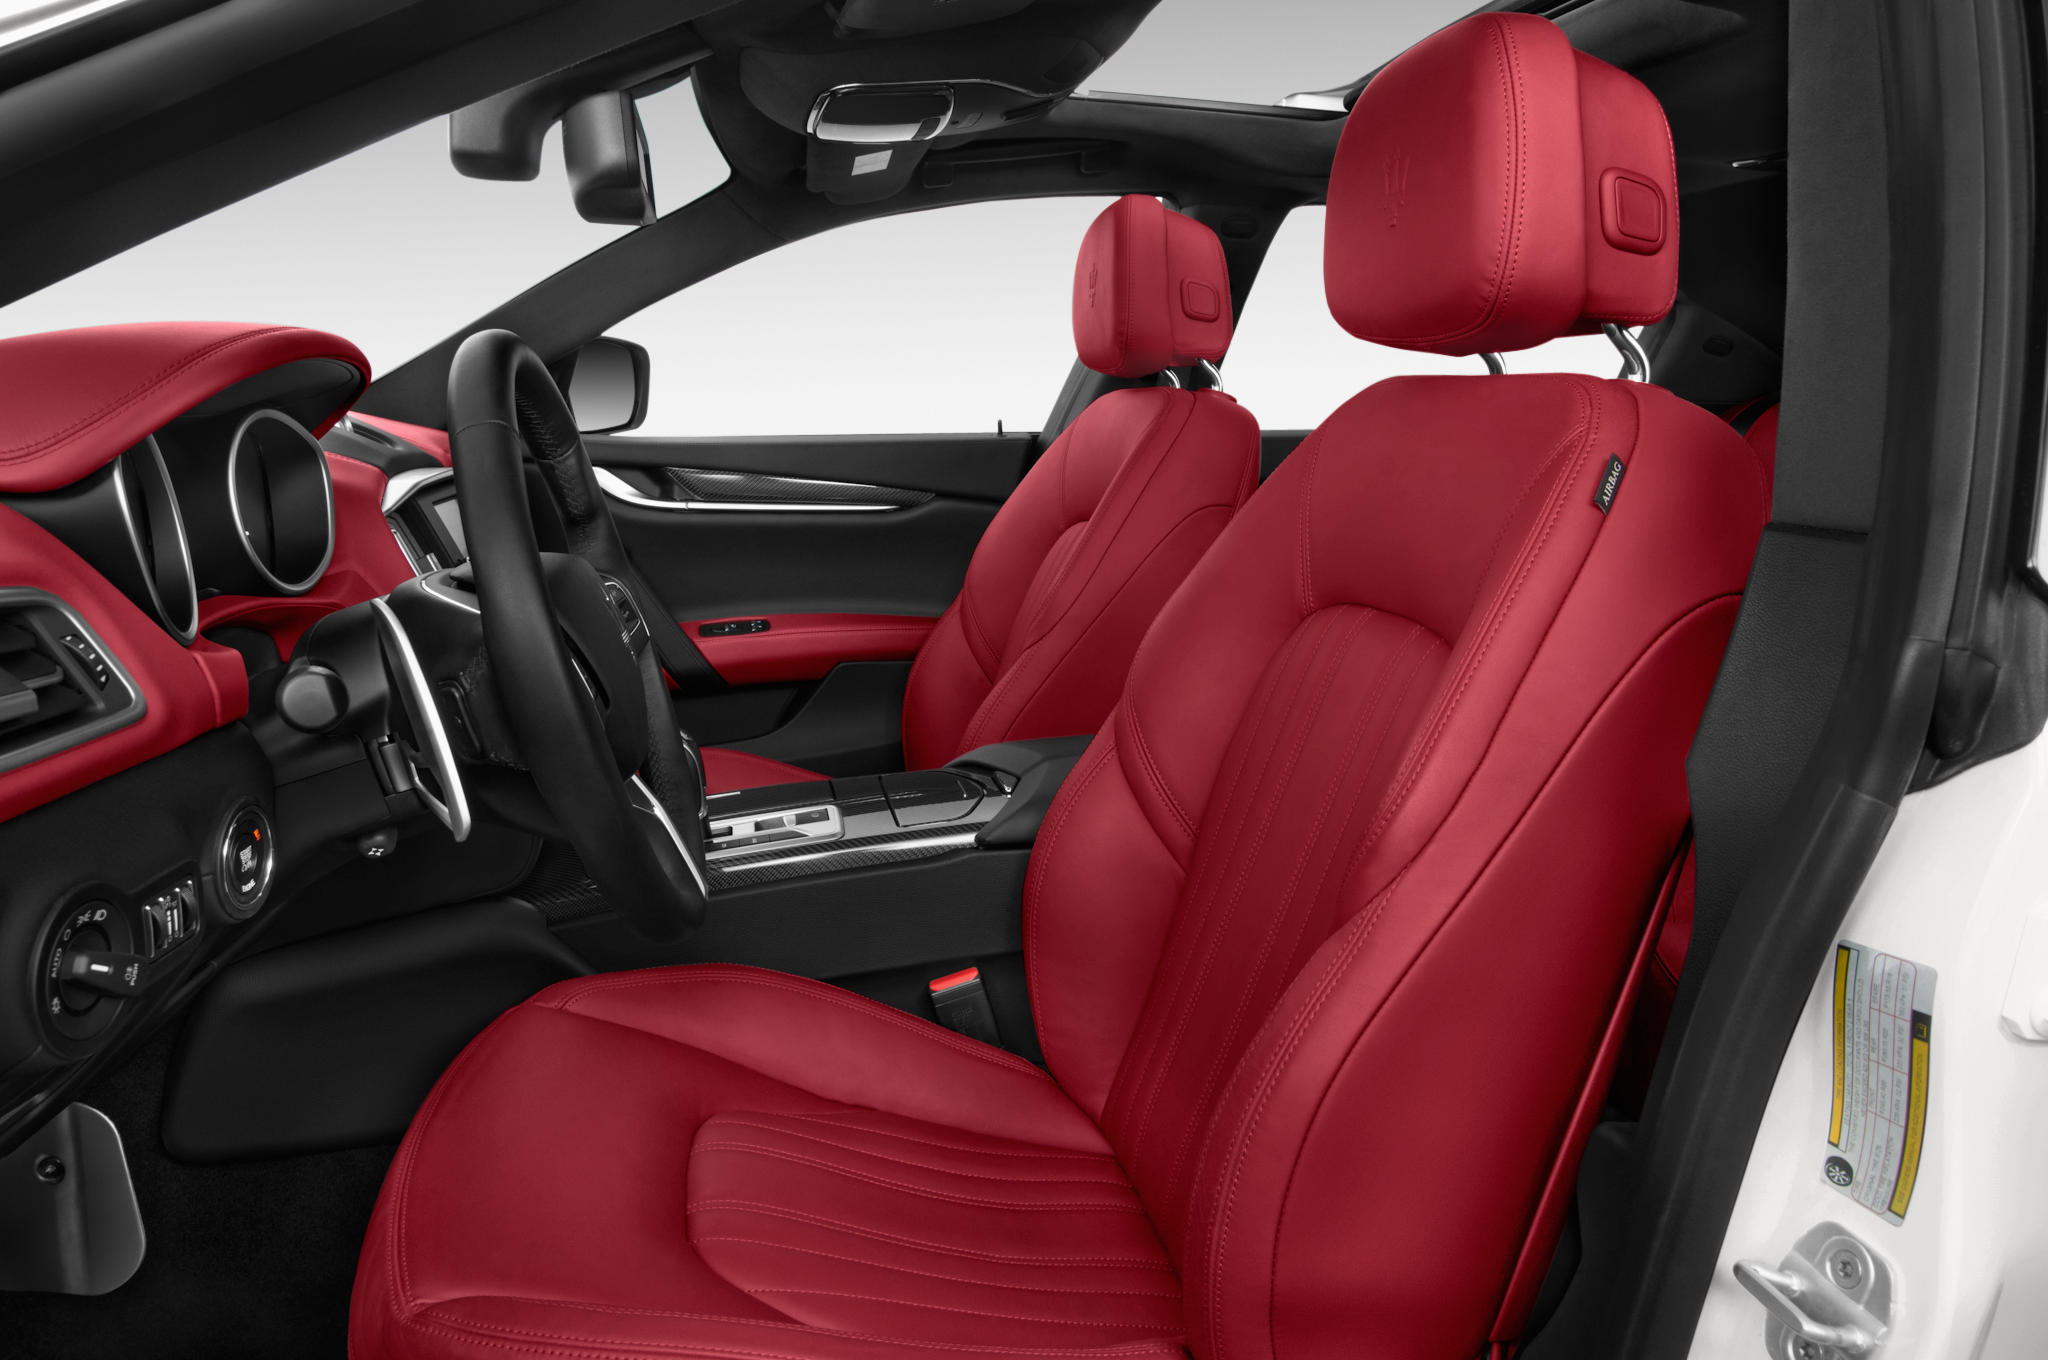 2016 Maserati Ghibli S Q4 One Week Review | Automobile ...